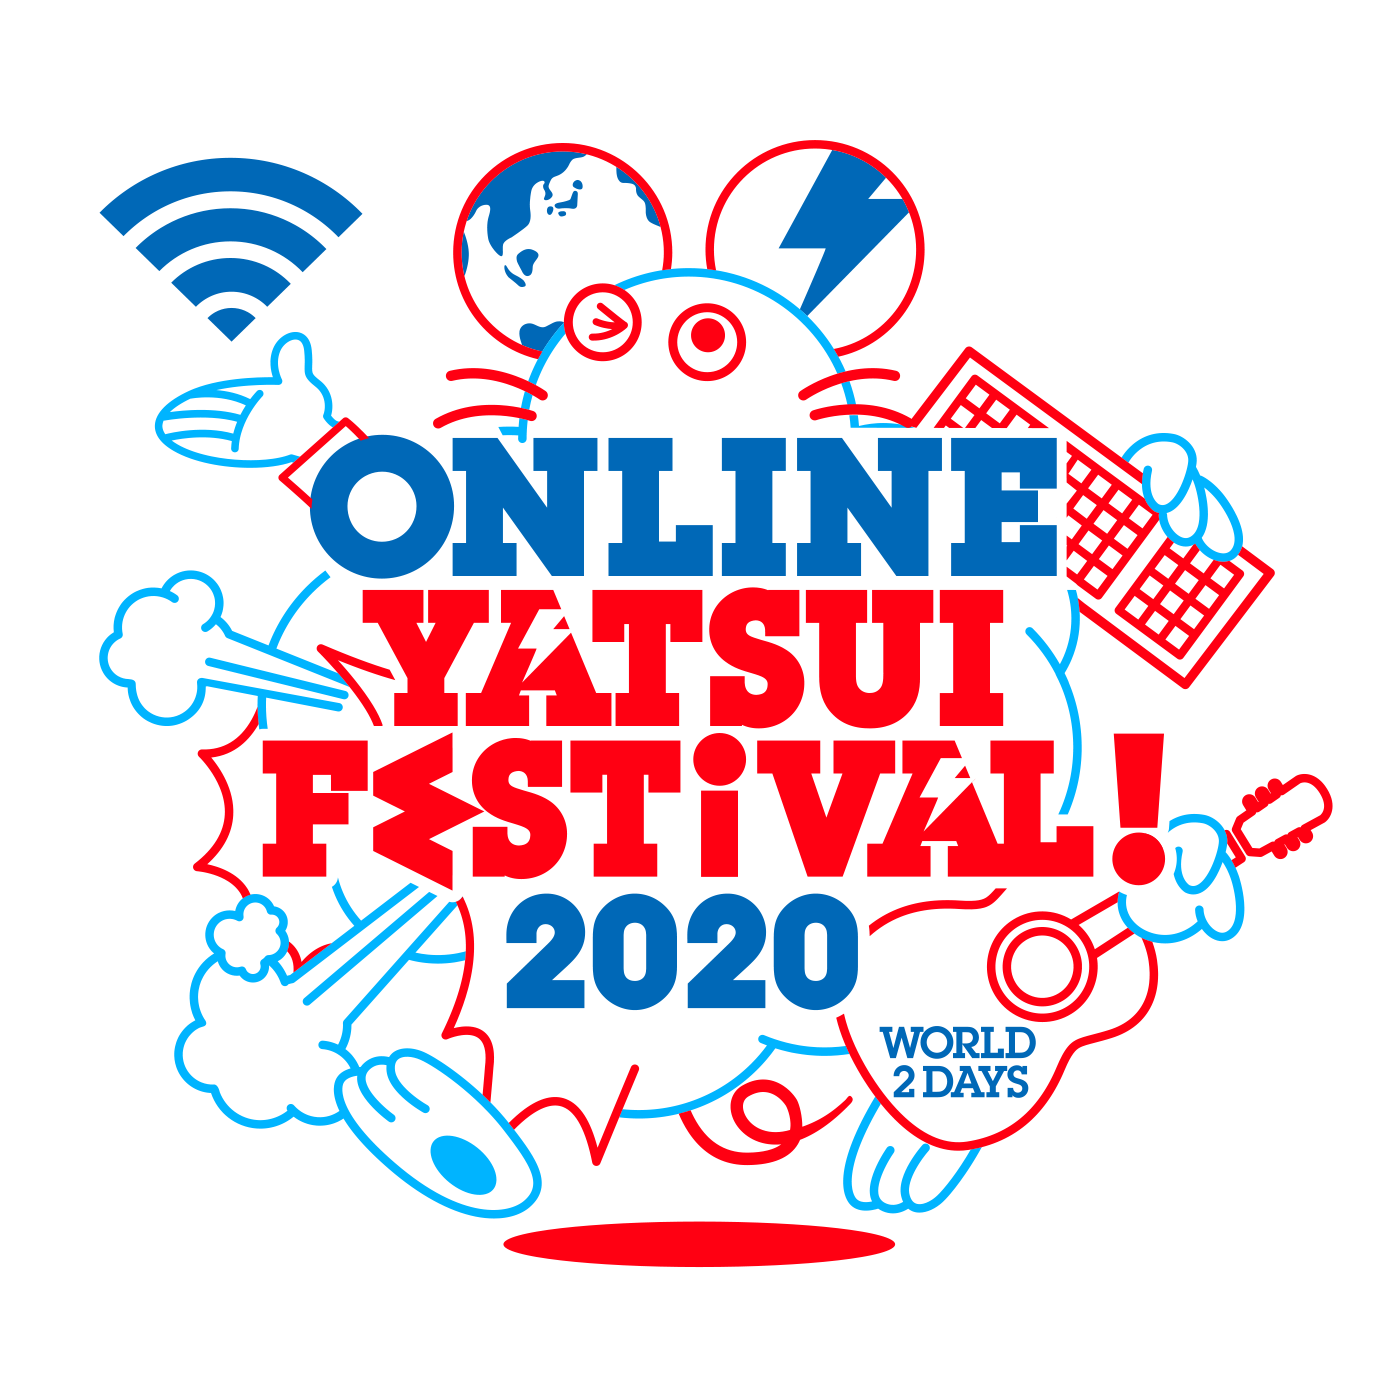 「ONLINE YATSUI FESTIVAL! 2020」(オンラインやついフェス)